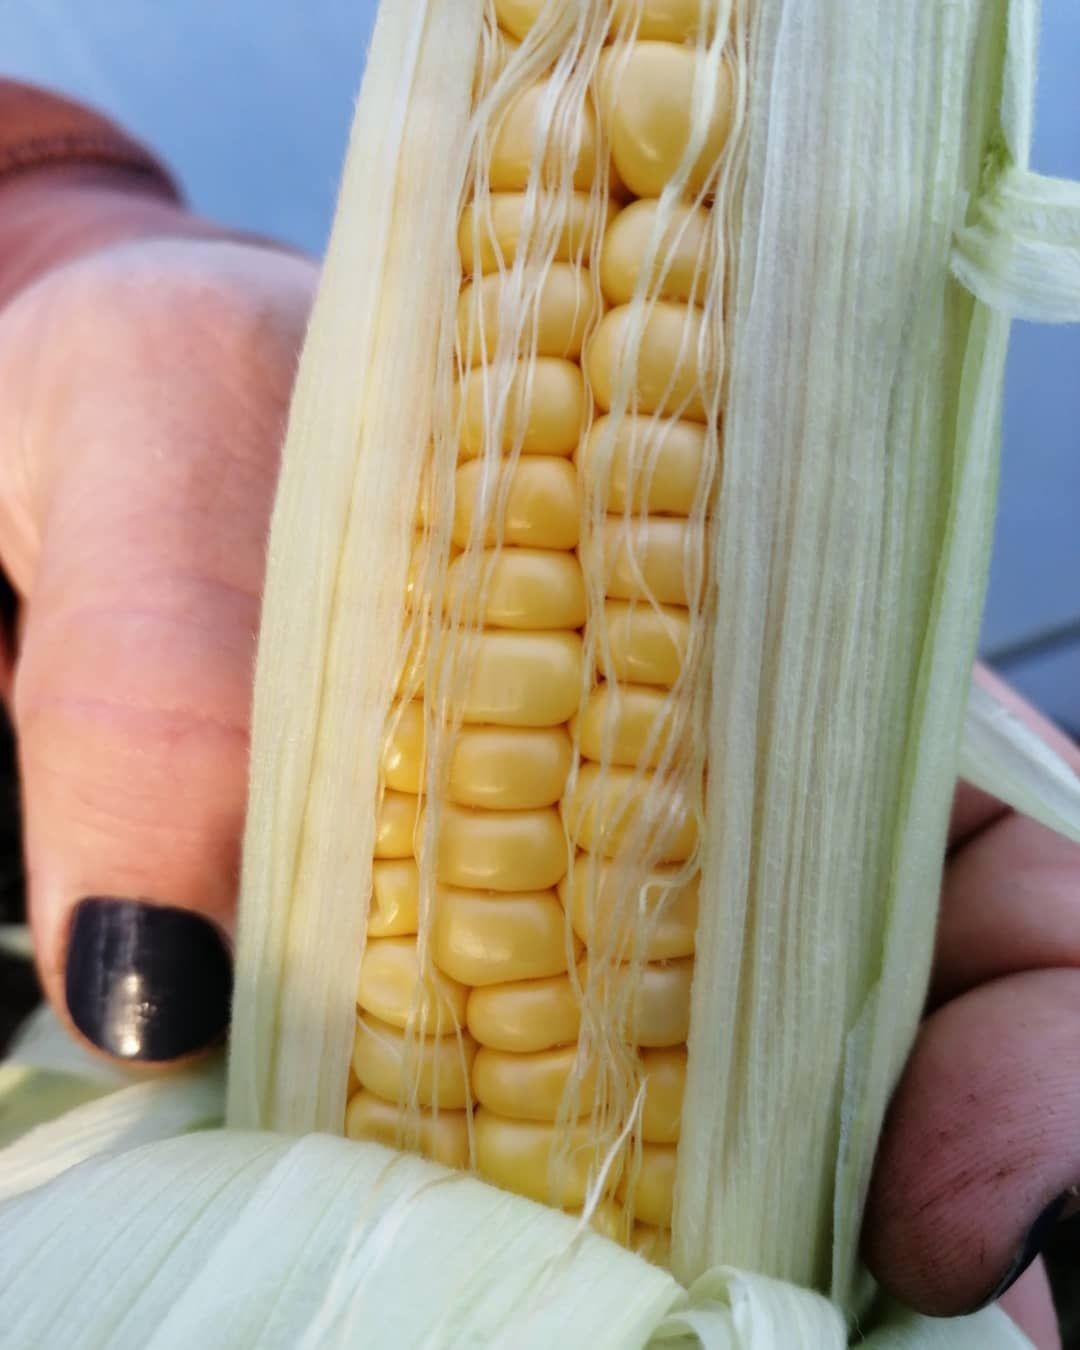 This Years Corn Is Ready Again So Sweet Can Never Grow Enough Of This Sweetcorn Corn Cornonthecob Corncob Co Growing Sweet Corn Veg Garden Corn On Cob